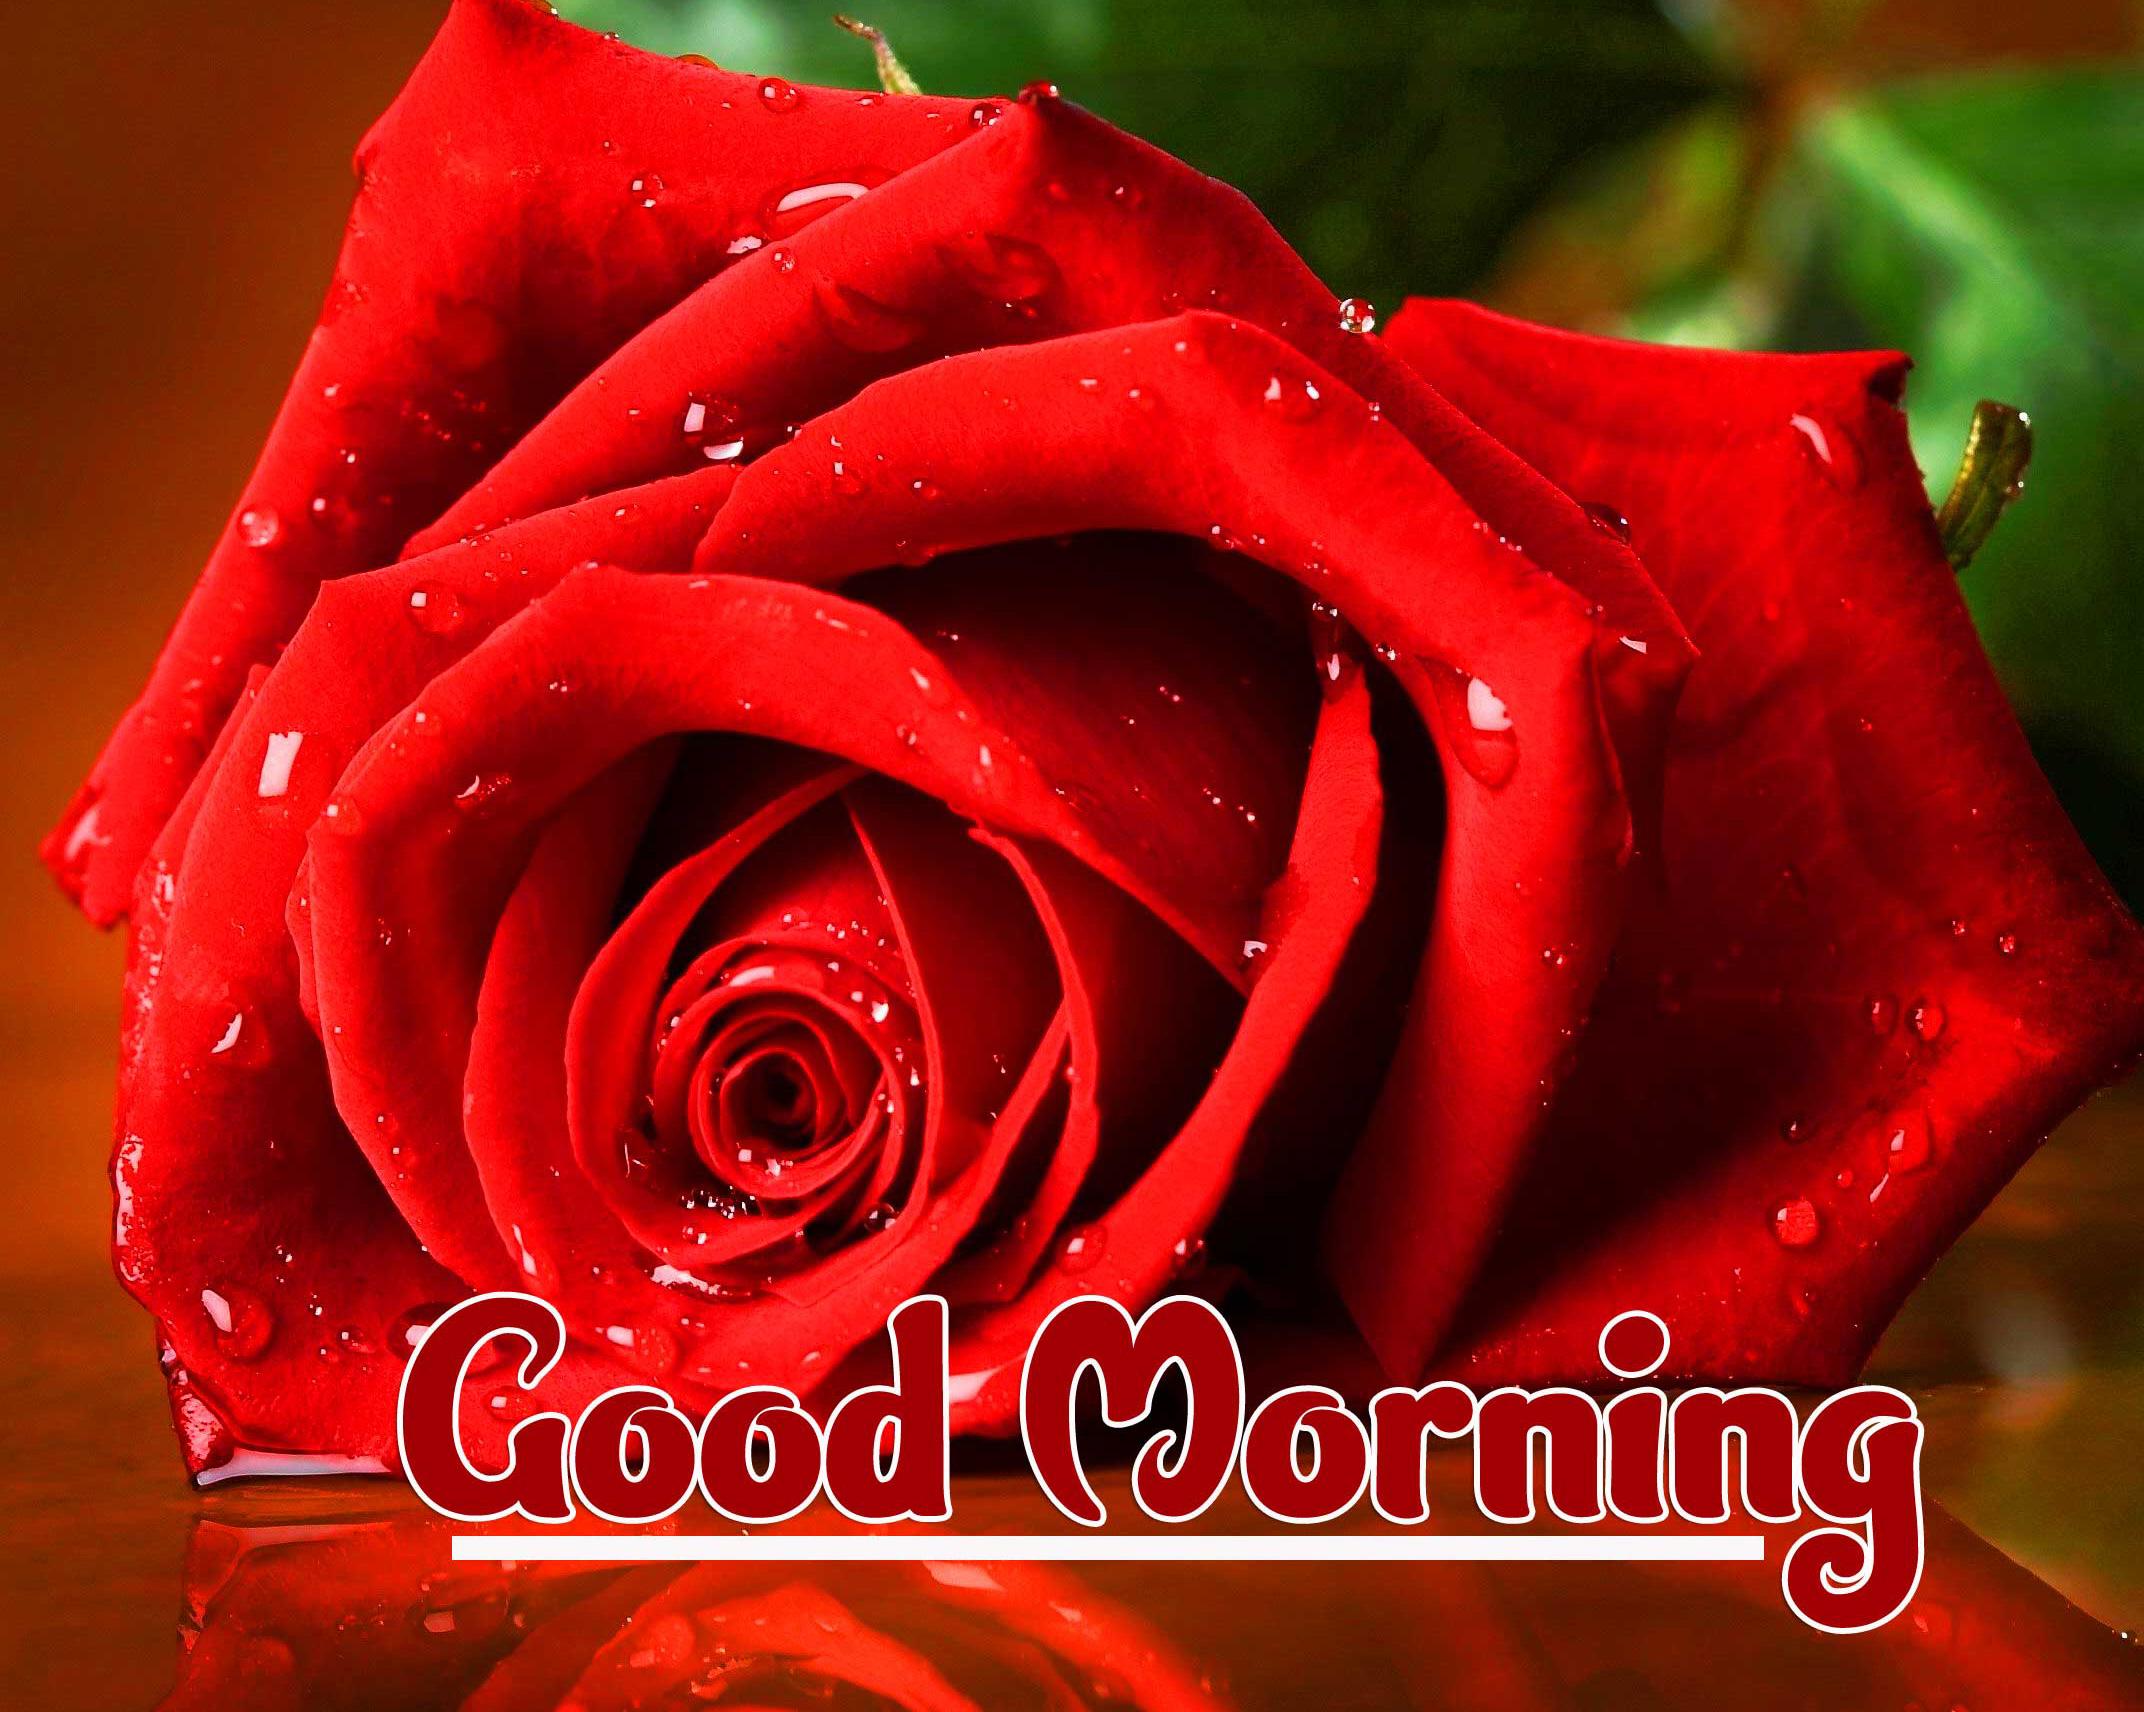 Rose HD Free 1080p Good Morning Pics Wallpaper Download